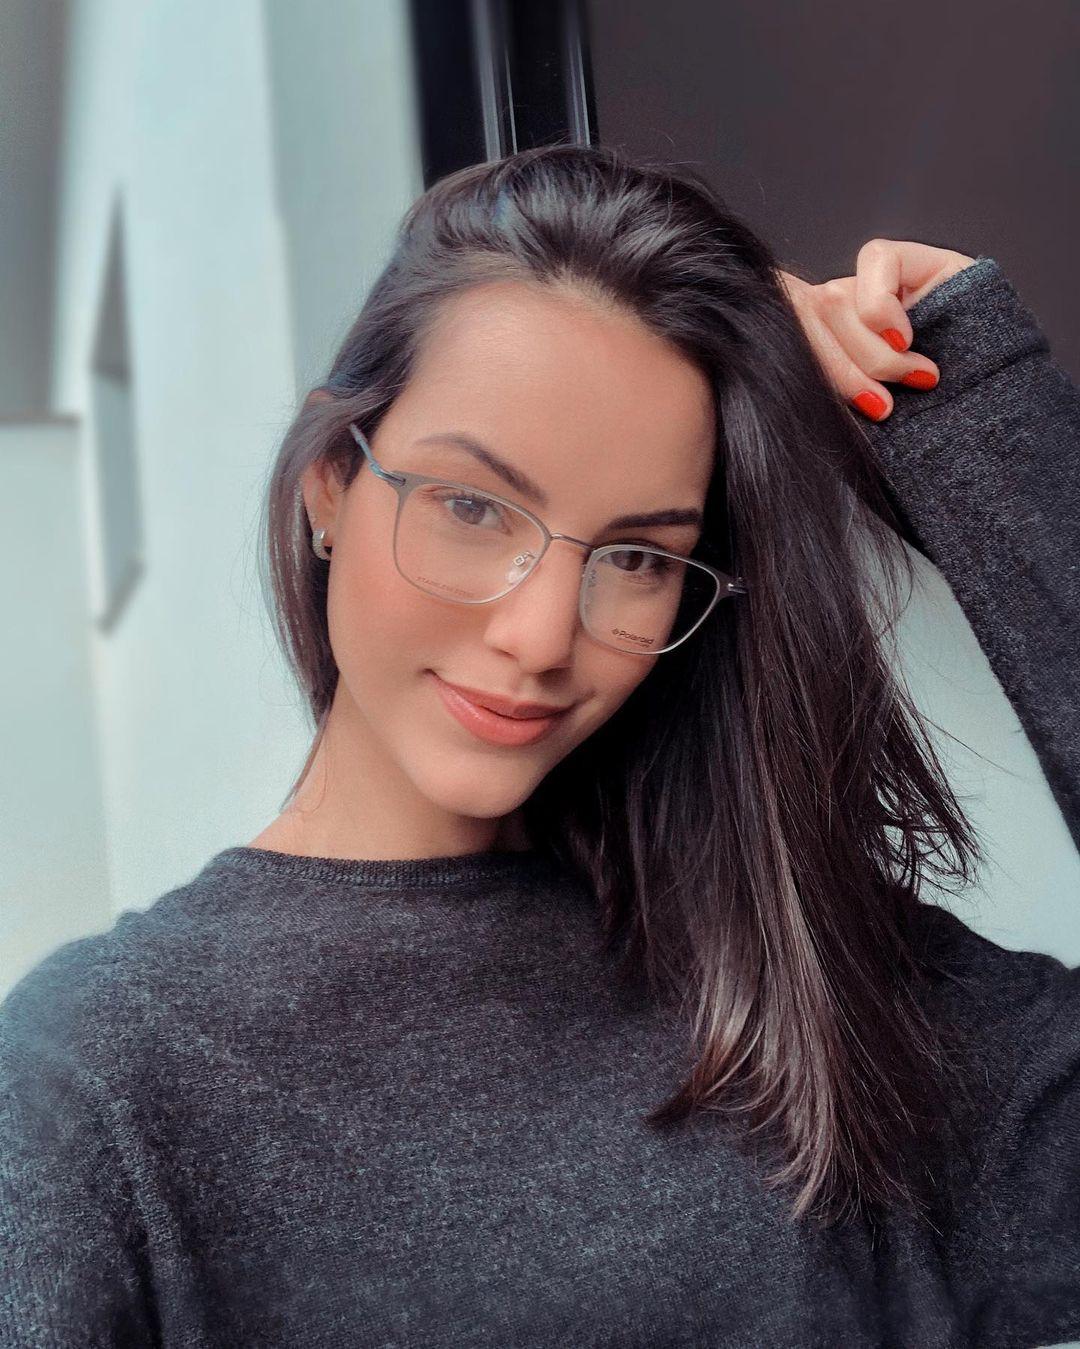 rafaella felipe, top 20 de miss brasil mundo 2019. - Página 3 Qtdets10